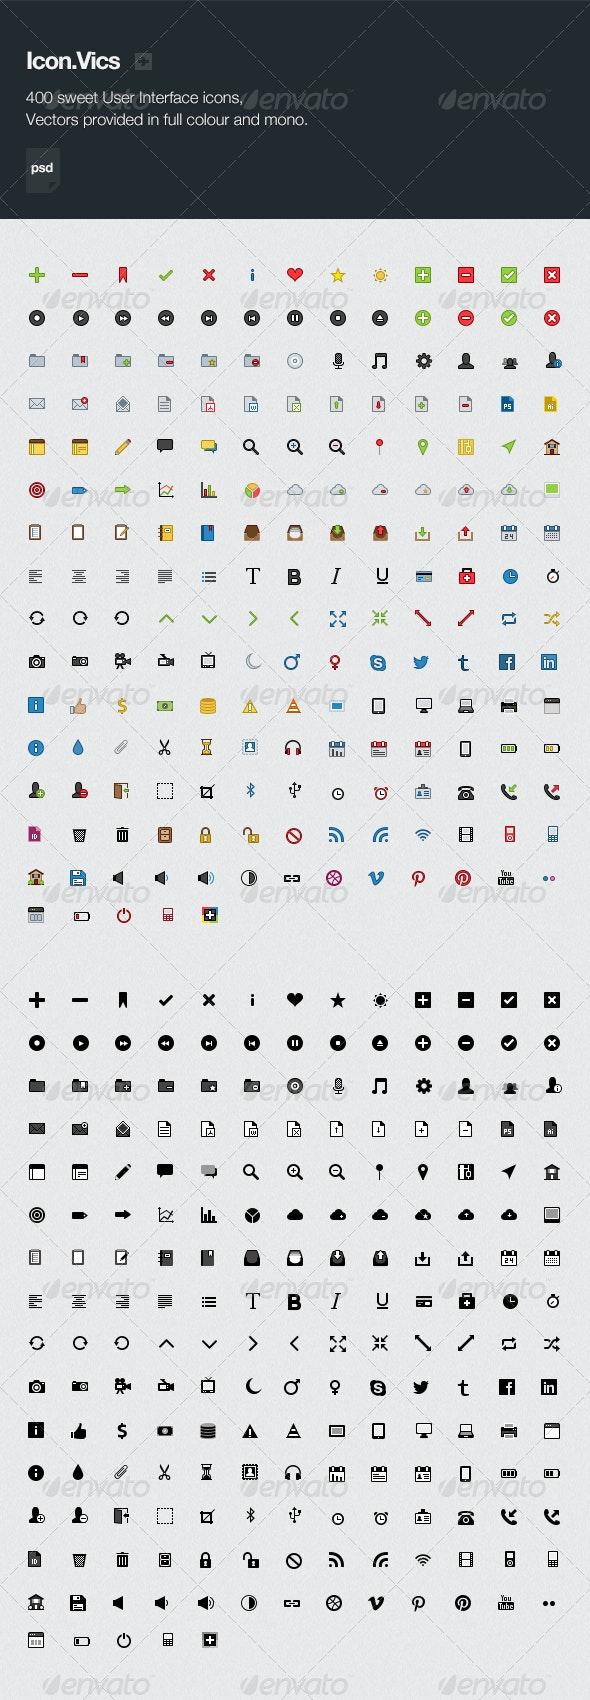 Icon.Vics - Web Icons